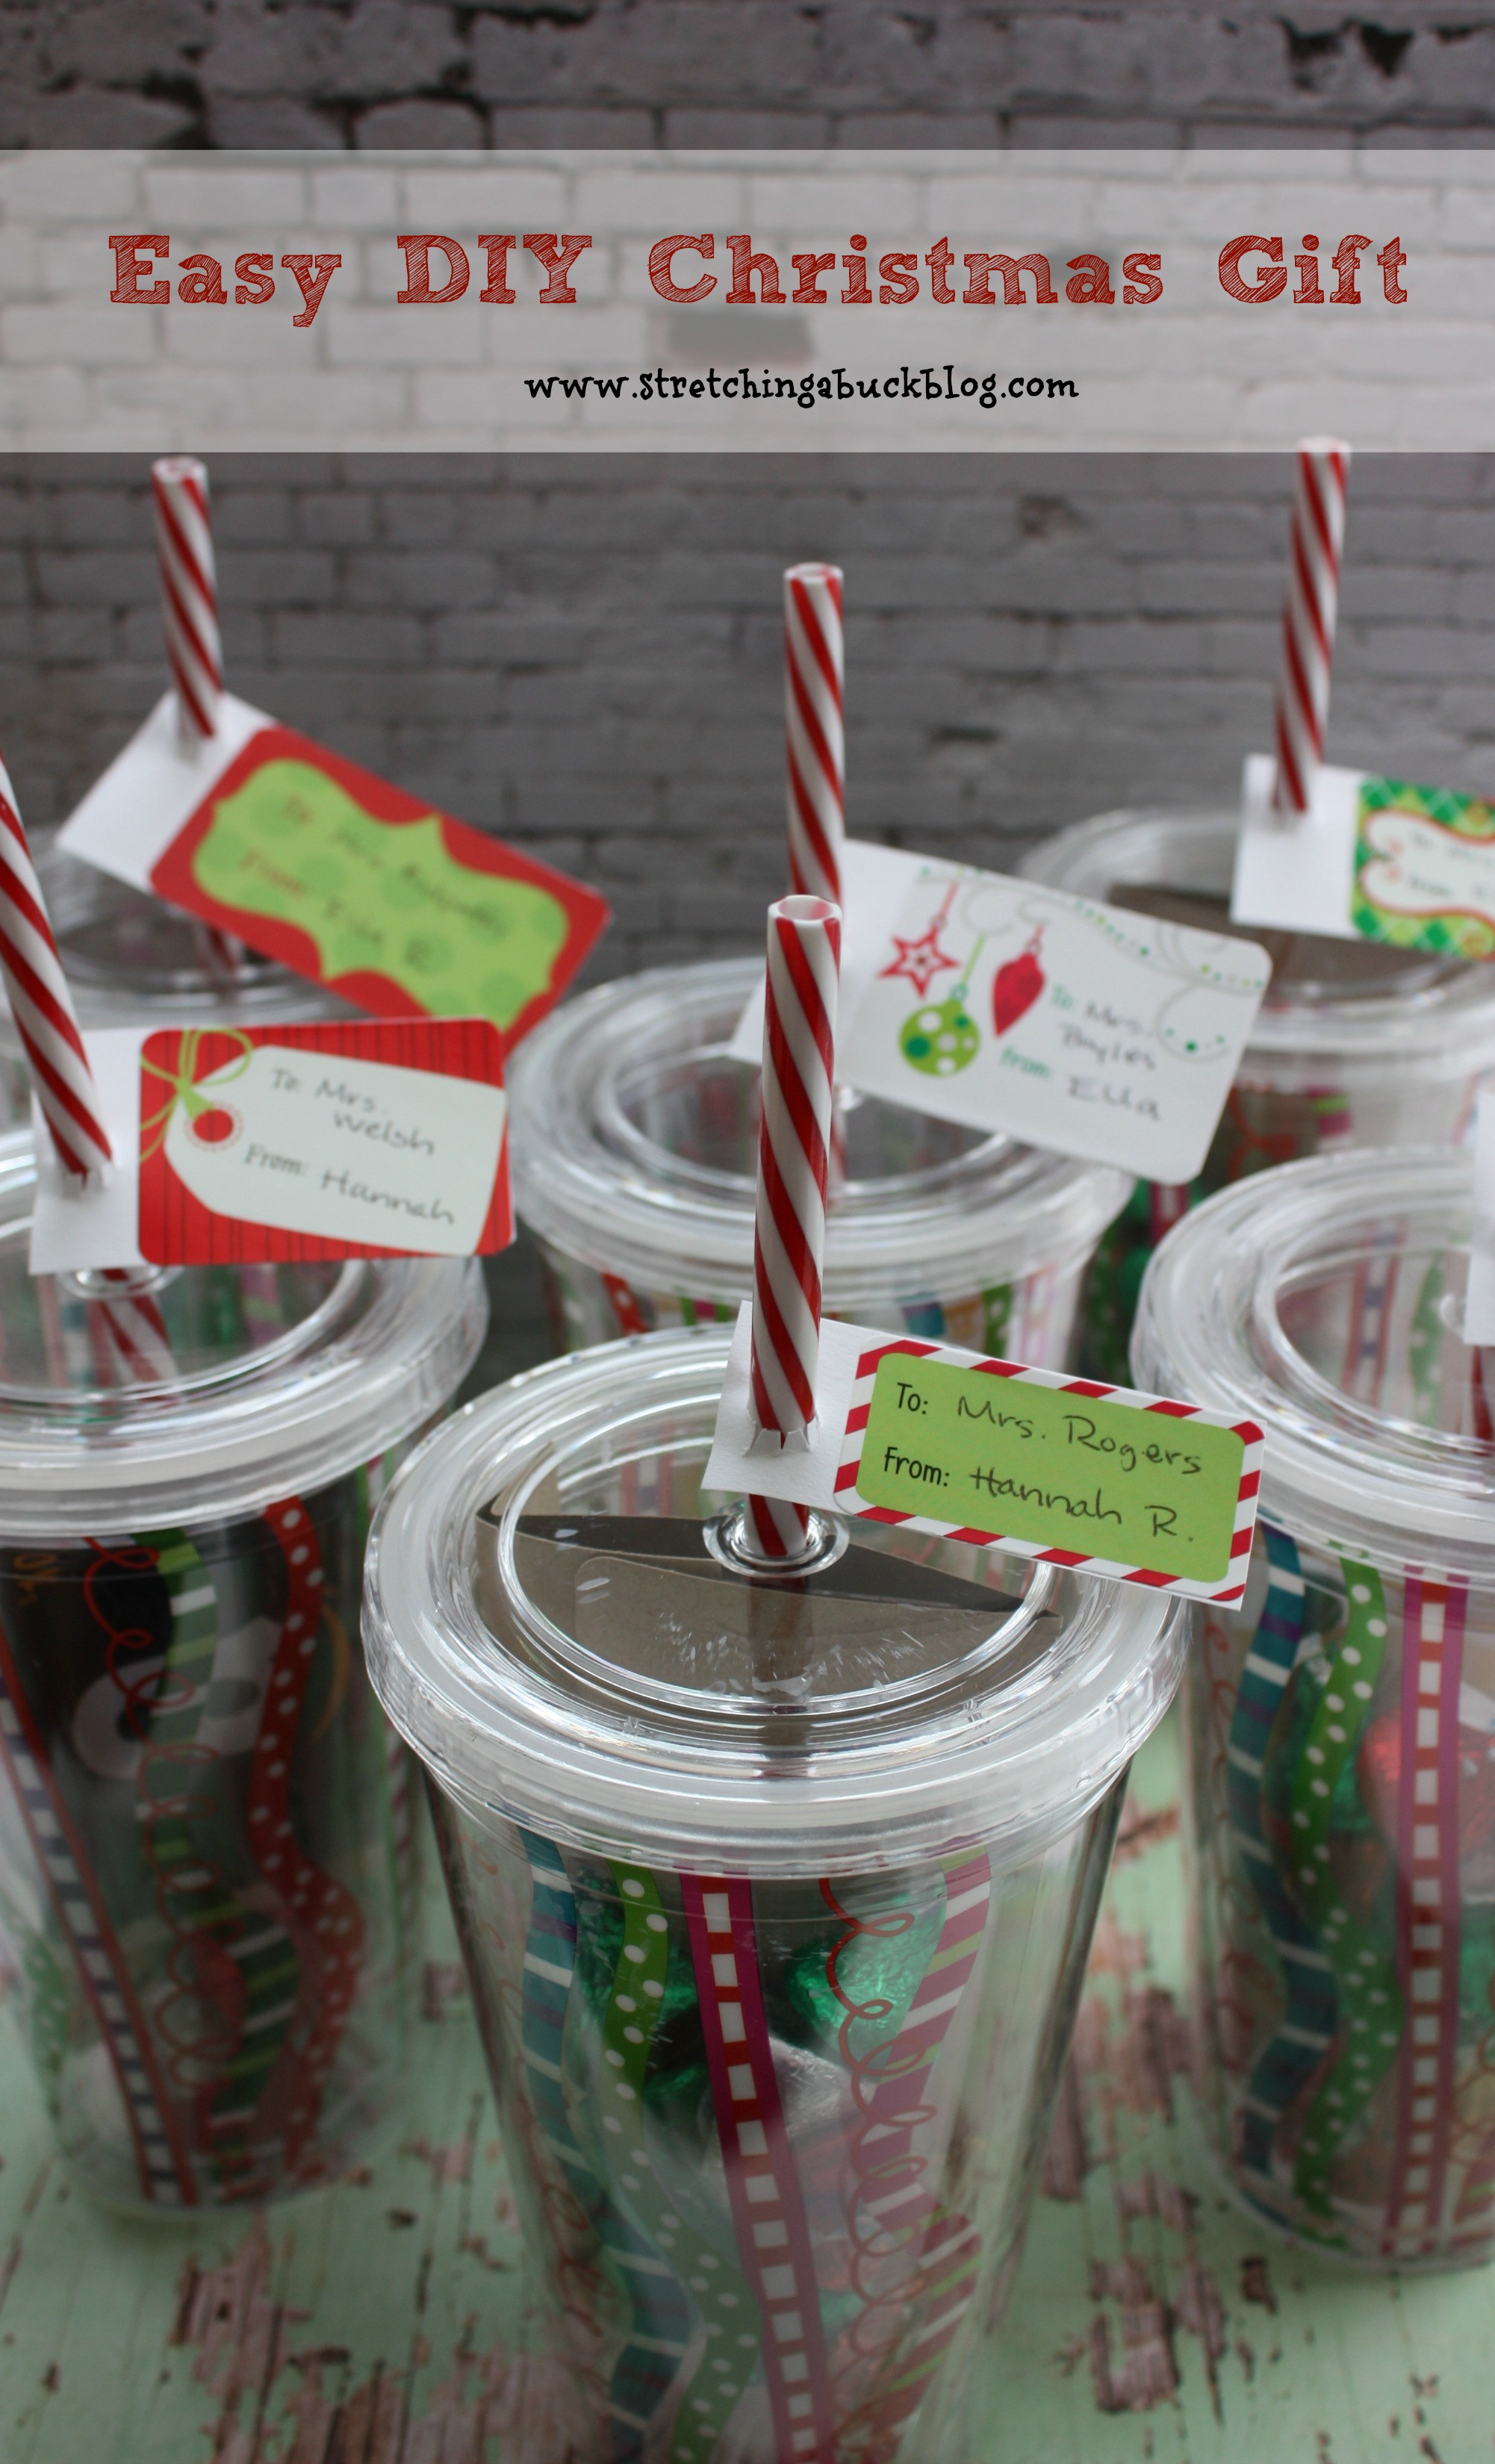 Easy Christmas Gift Ideas  Easy DIY Christmas Gift Idea for Teachers Friends More